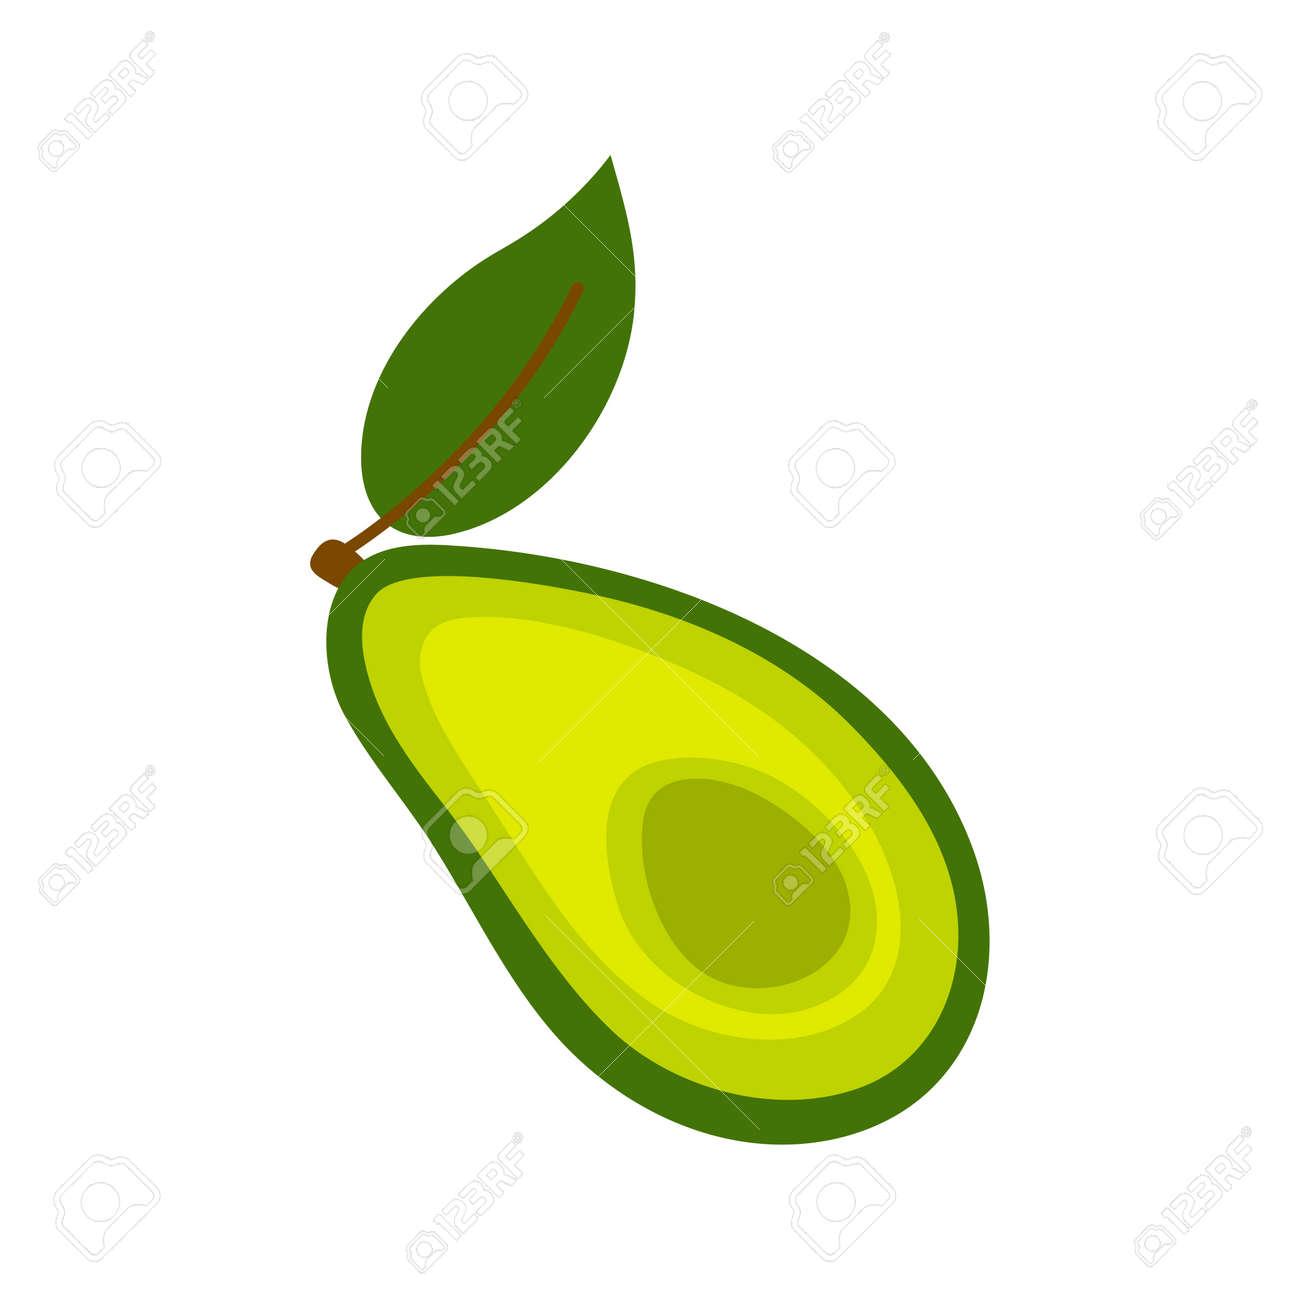 Avocado icon. Flat illustration of avocado vector icon isolated on white background. - 169771951